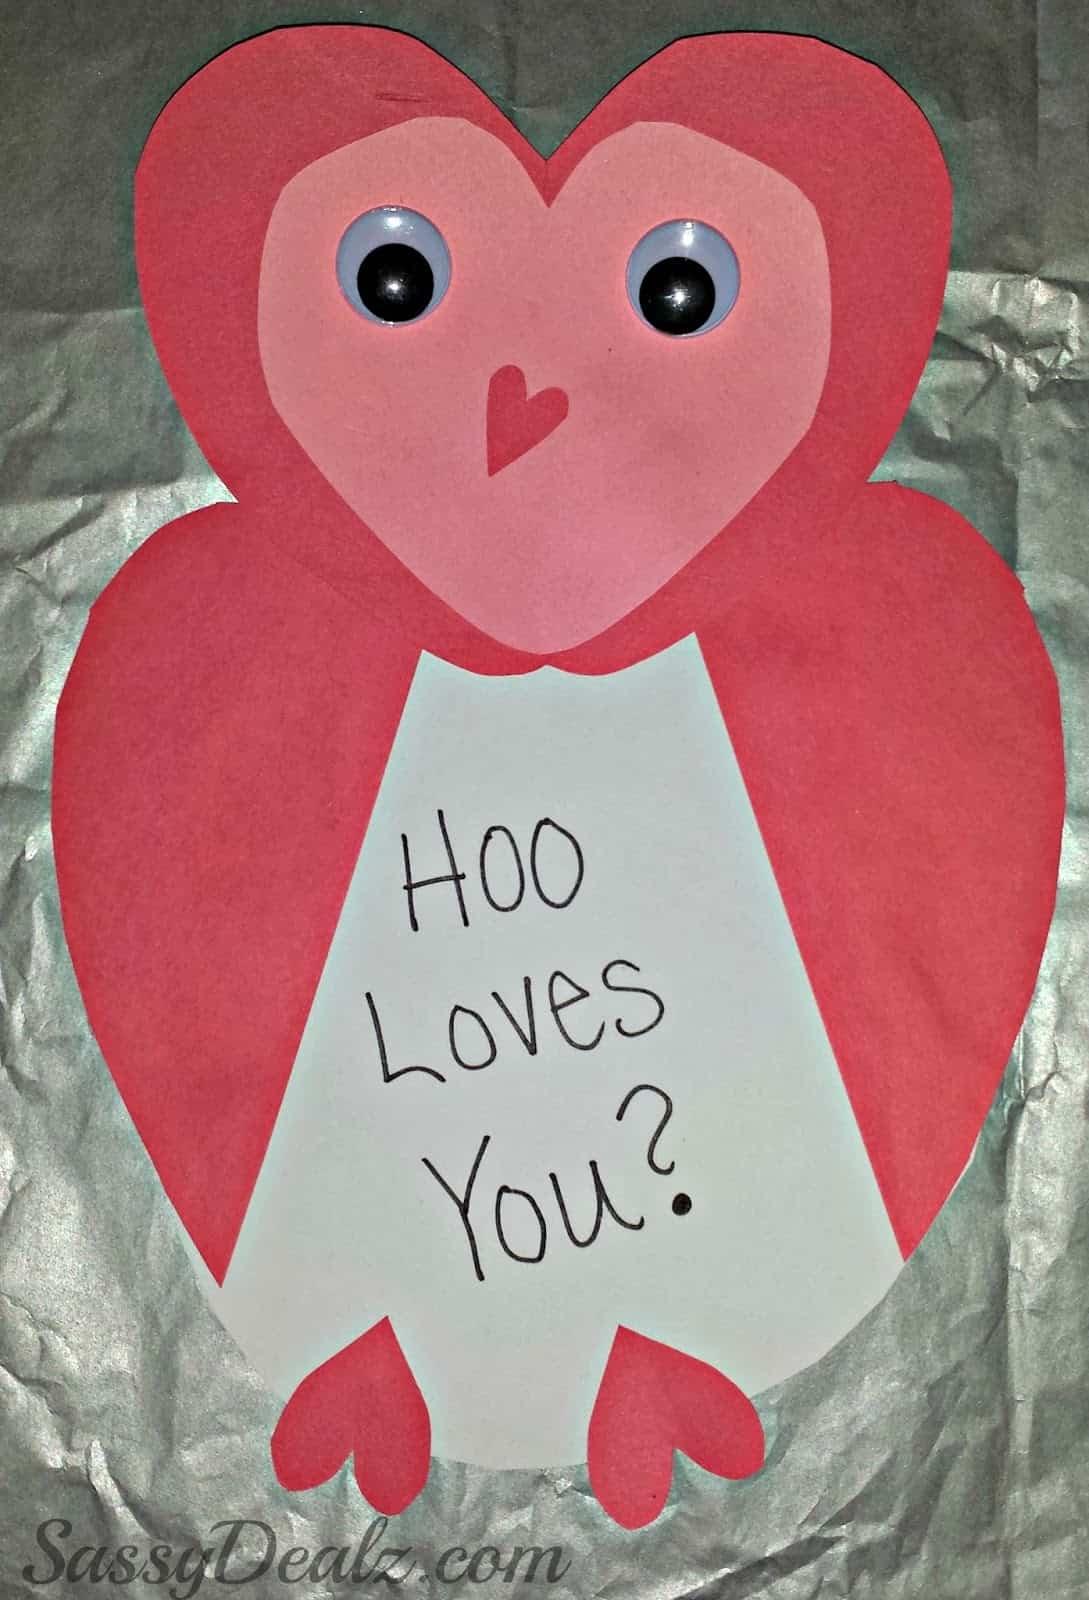 Hoo loves you owls